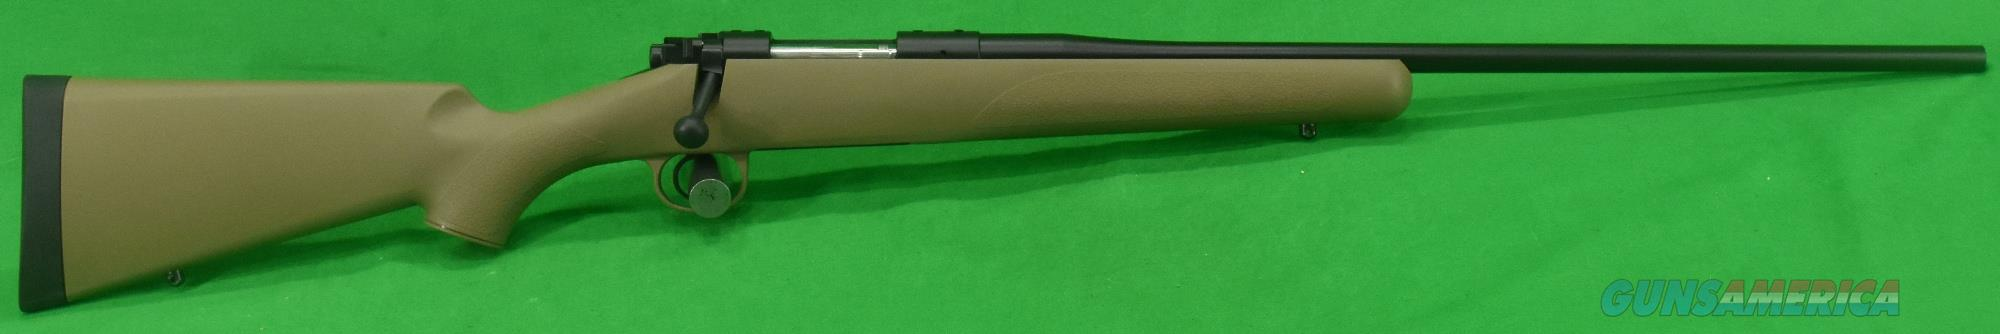 84M Hunter Black FDE 308 Win 22In  3000850  Guns > Rifles > Kimber of America Rifles